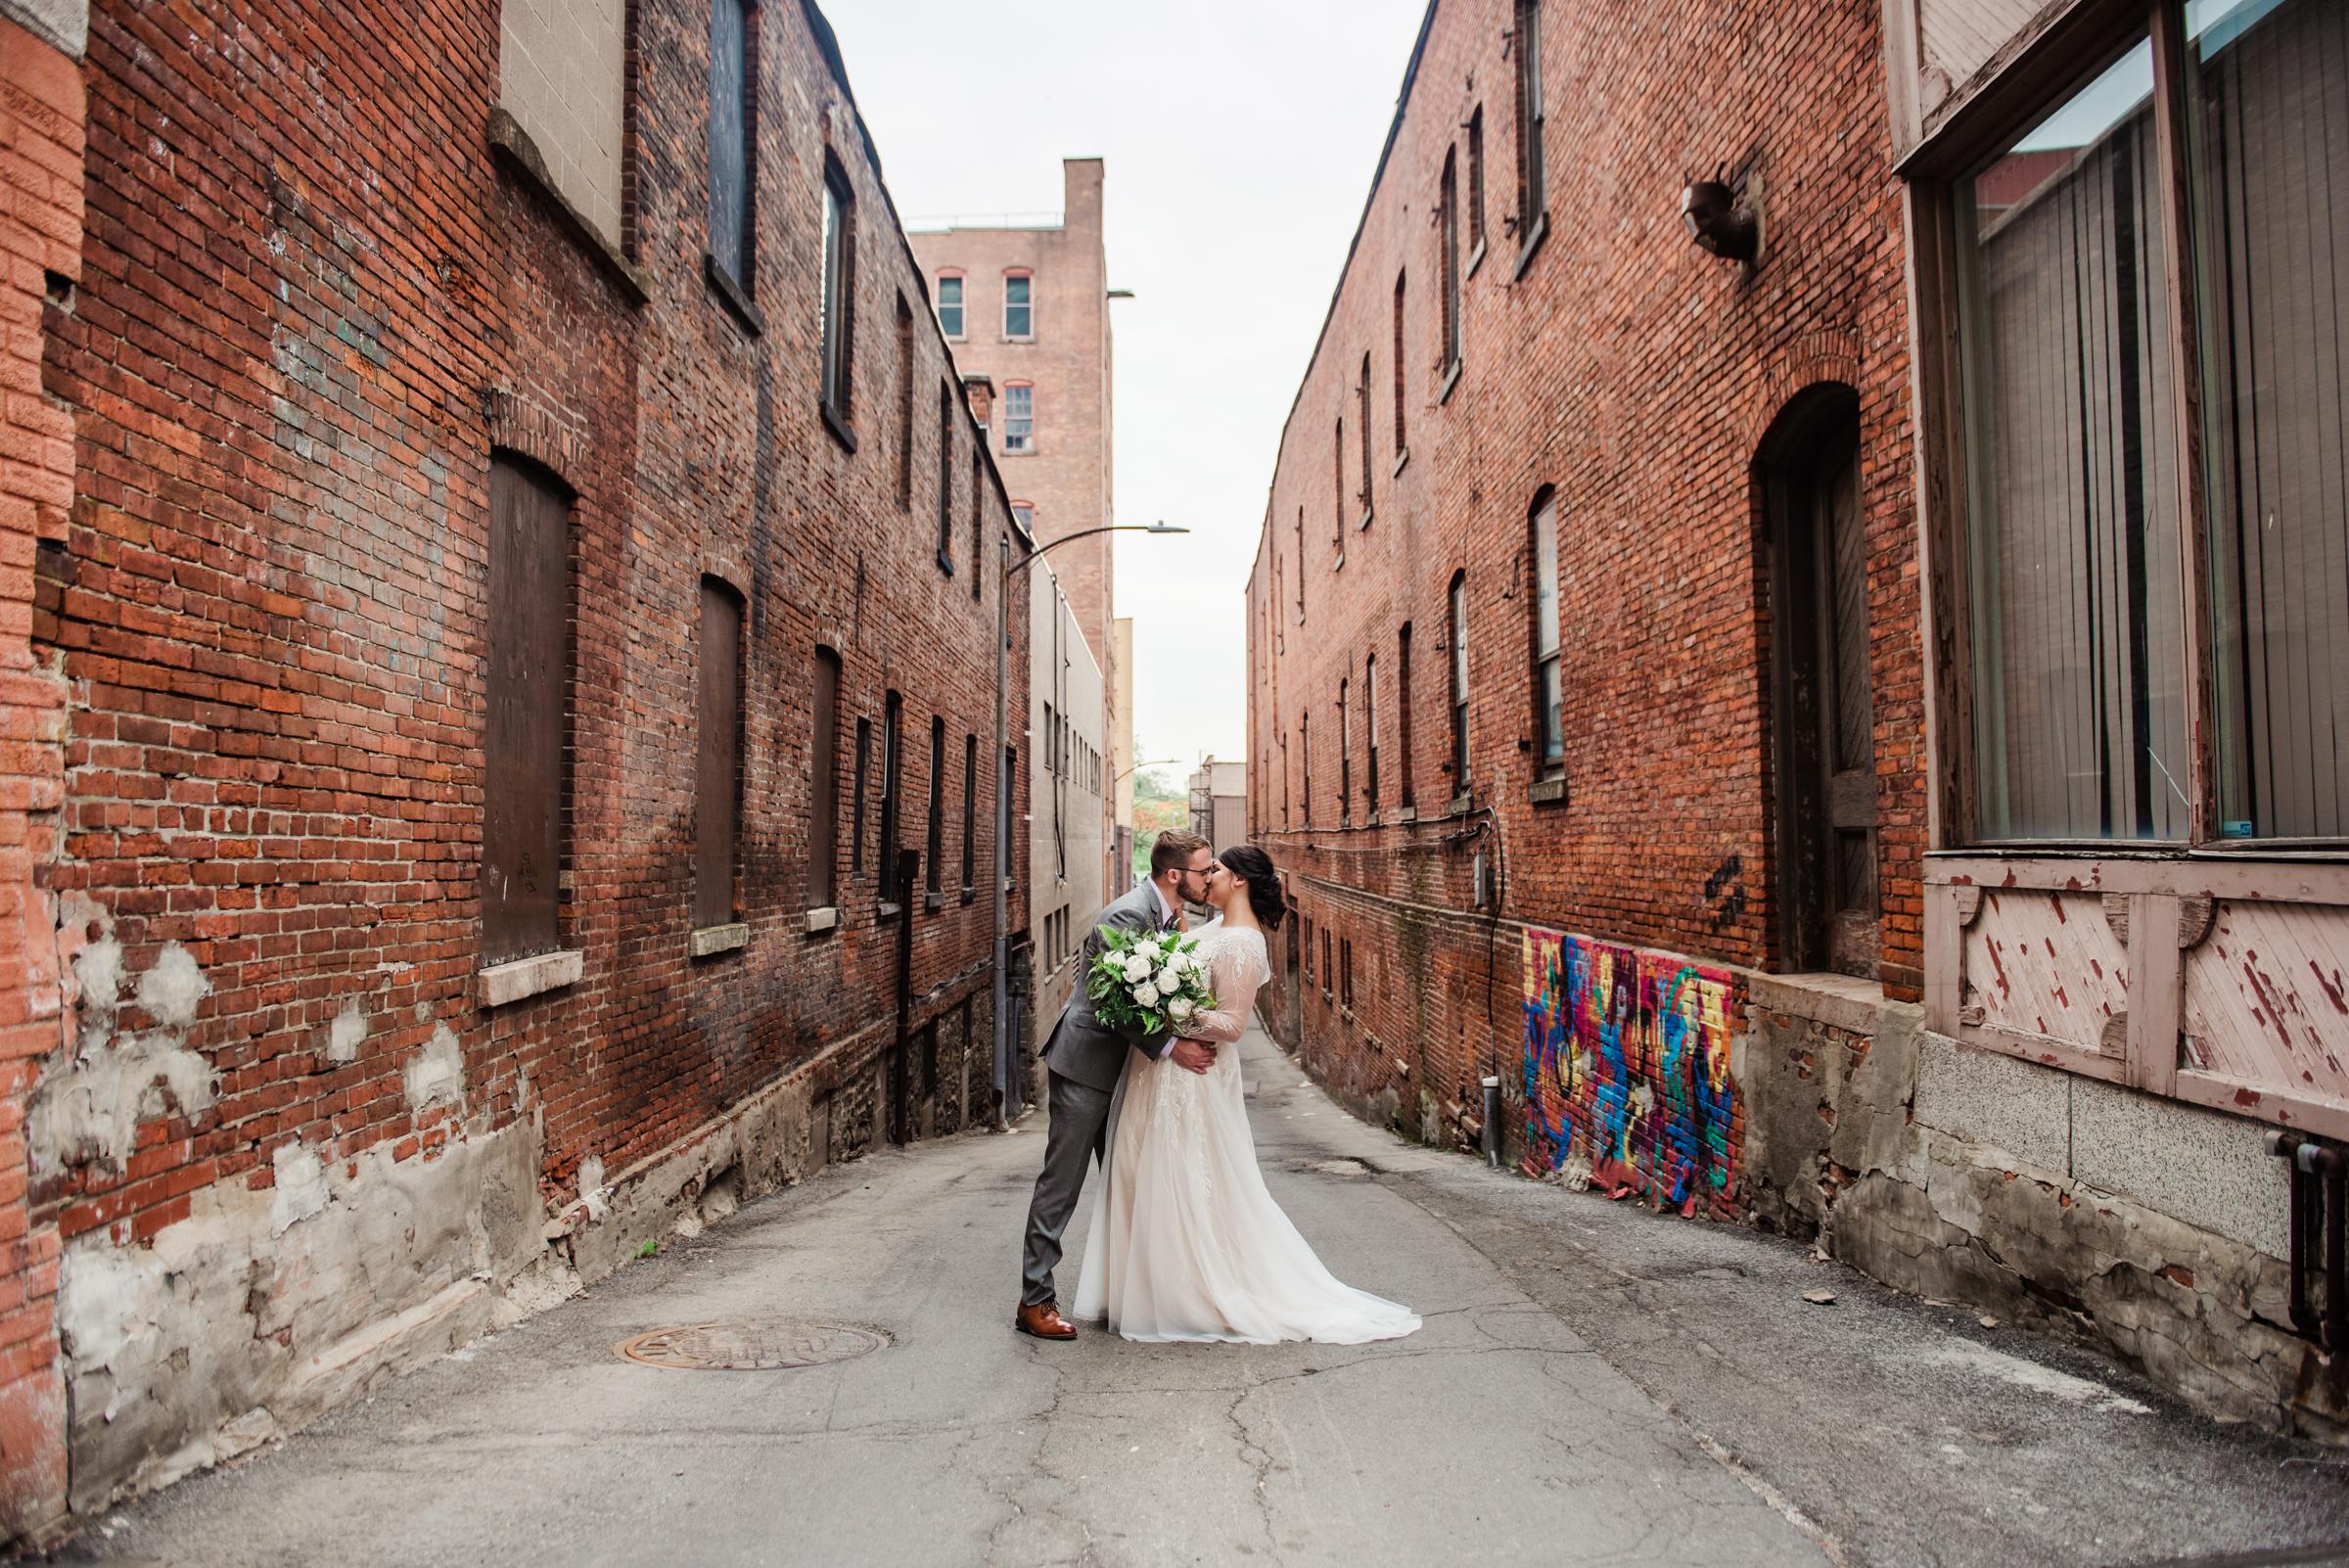 Studio_180_Lamberton_Conservatory_Rochester_Wedding_JILL_STUDIO_Rochester_NY_Photographer_DSC_9031.jpg